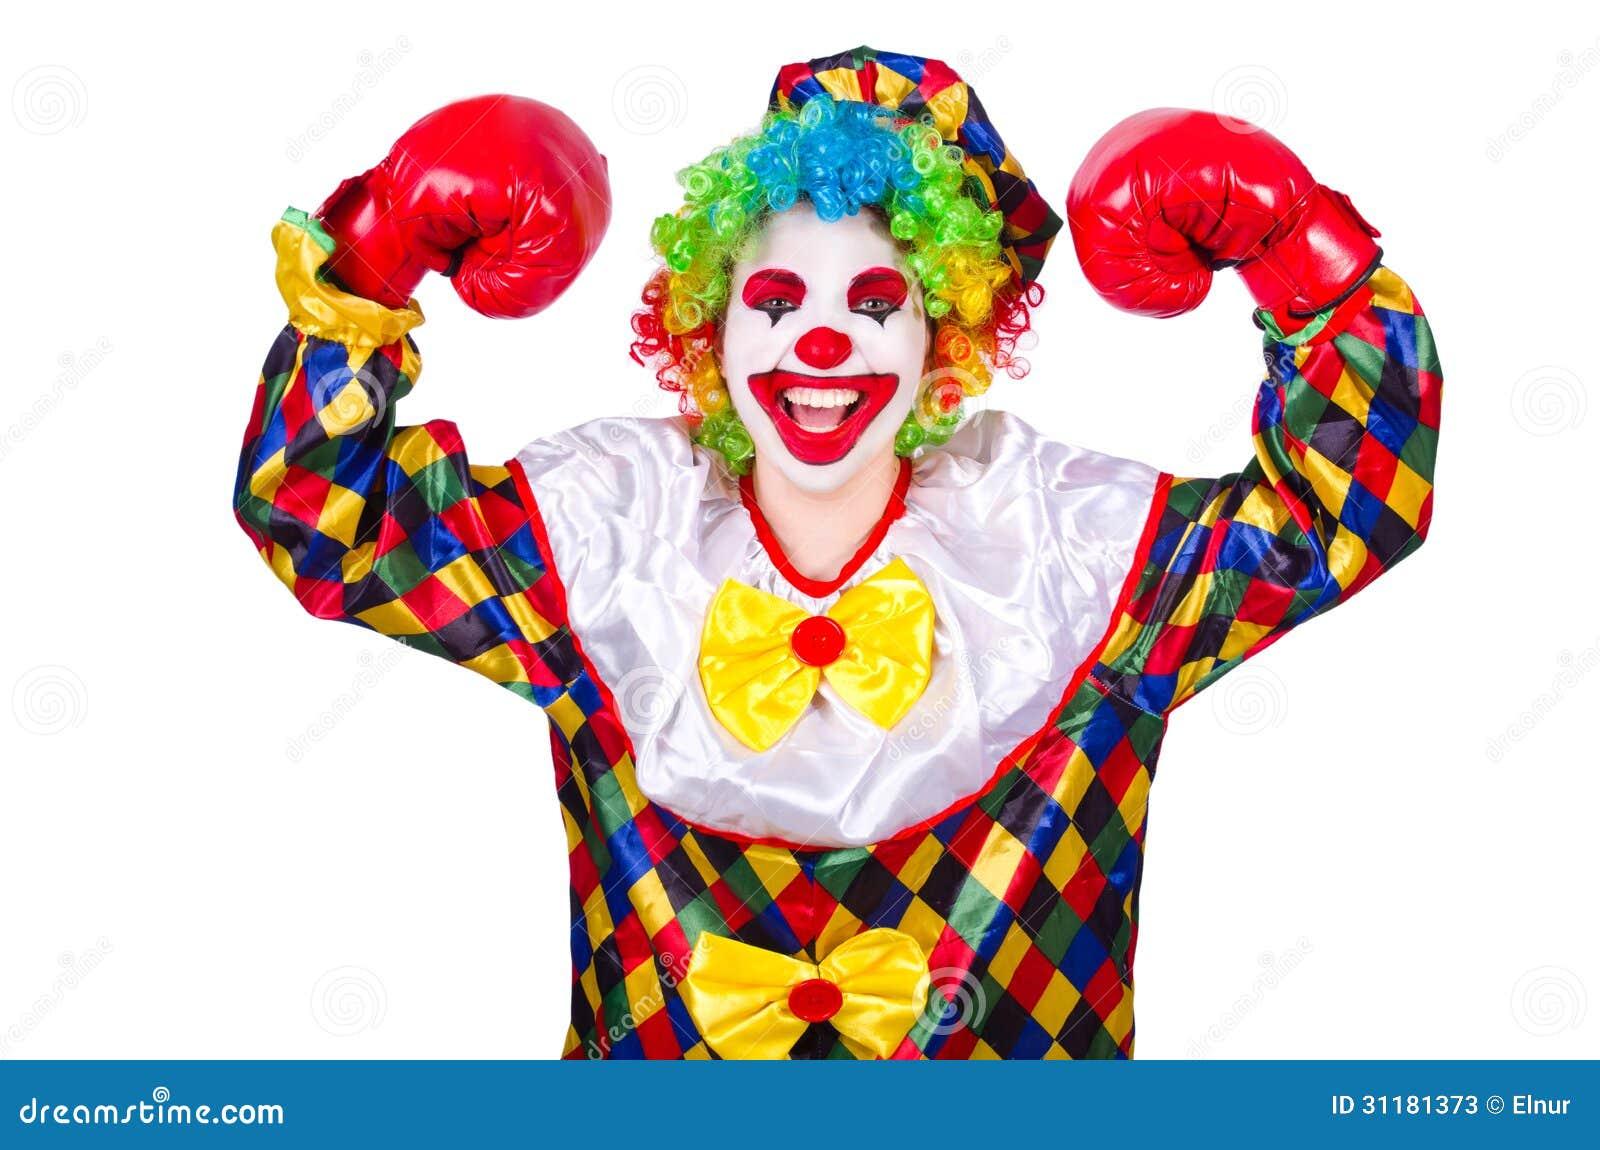 Funny Clown Stock Photos - Image: 31181373